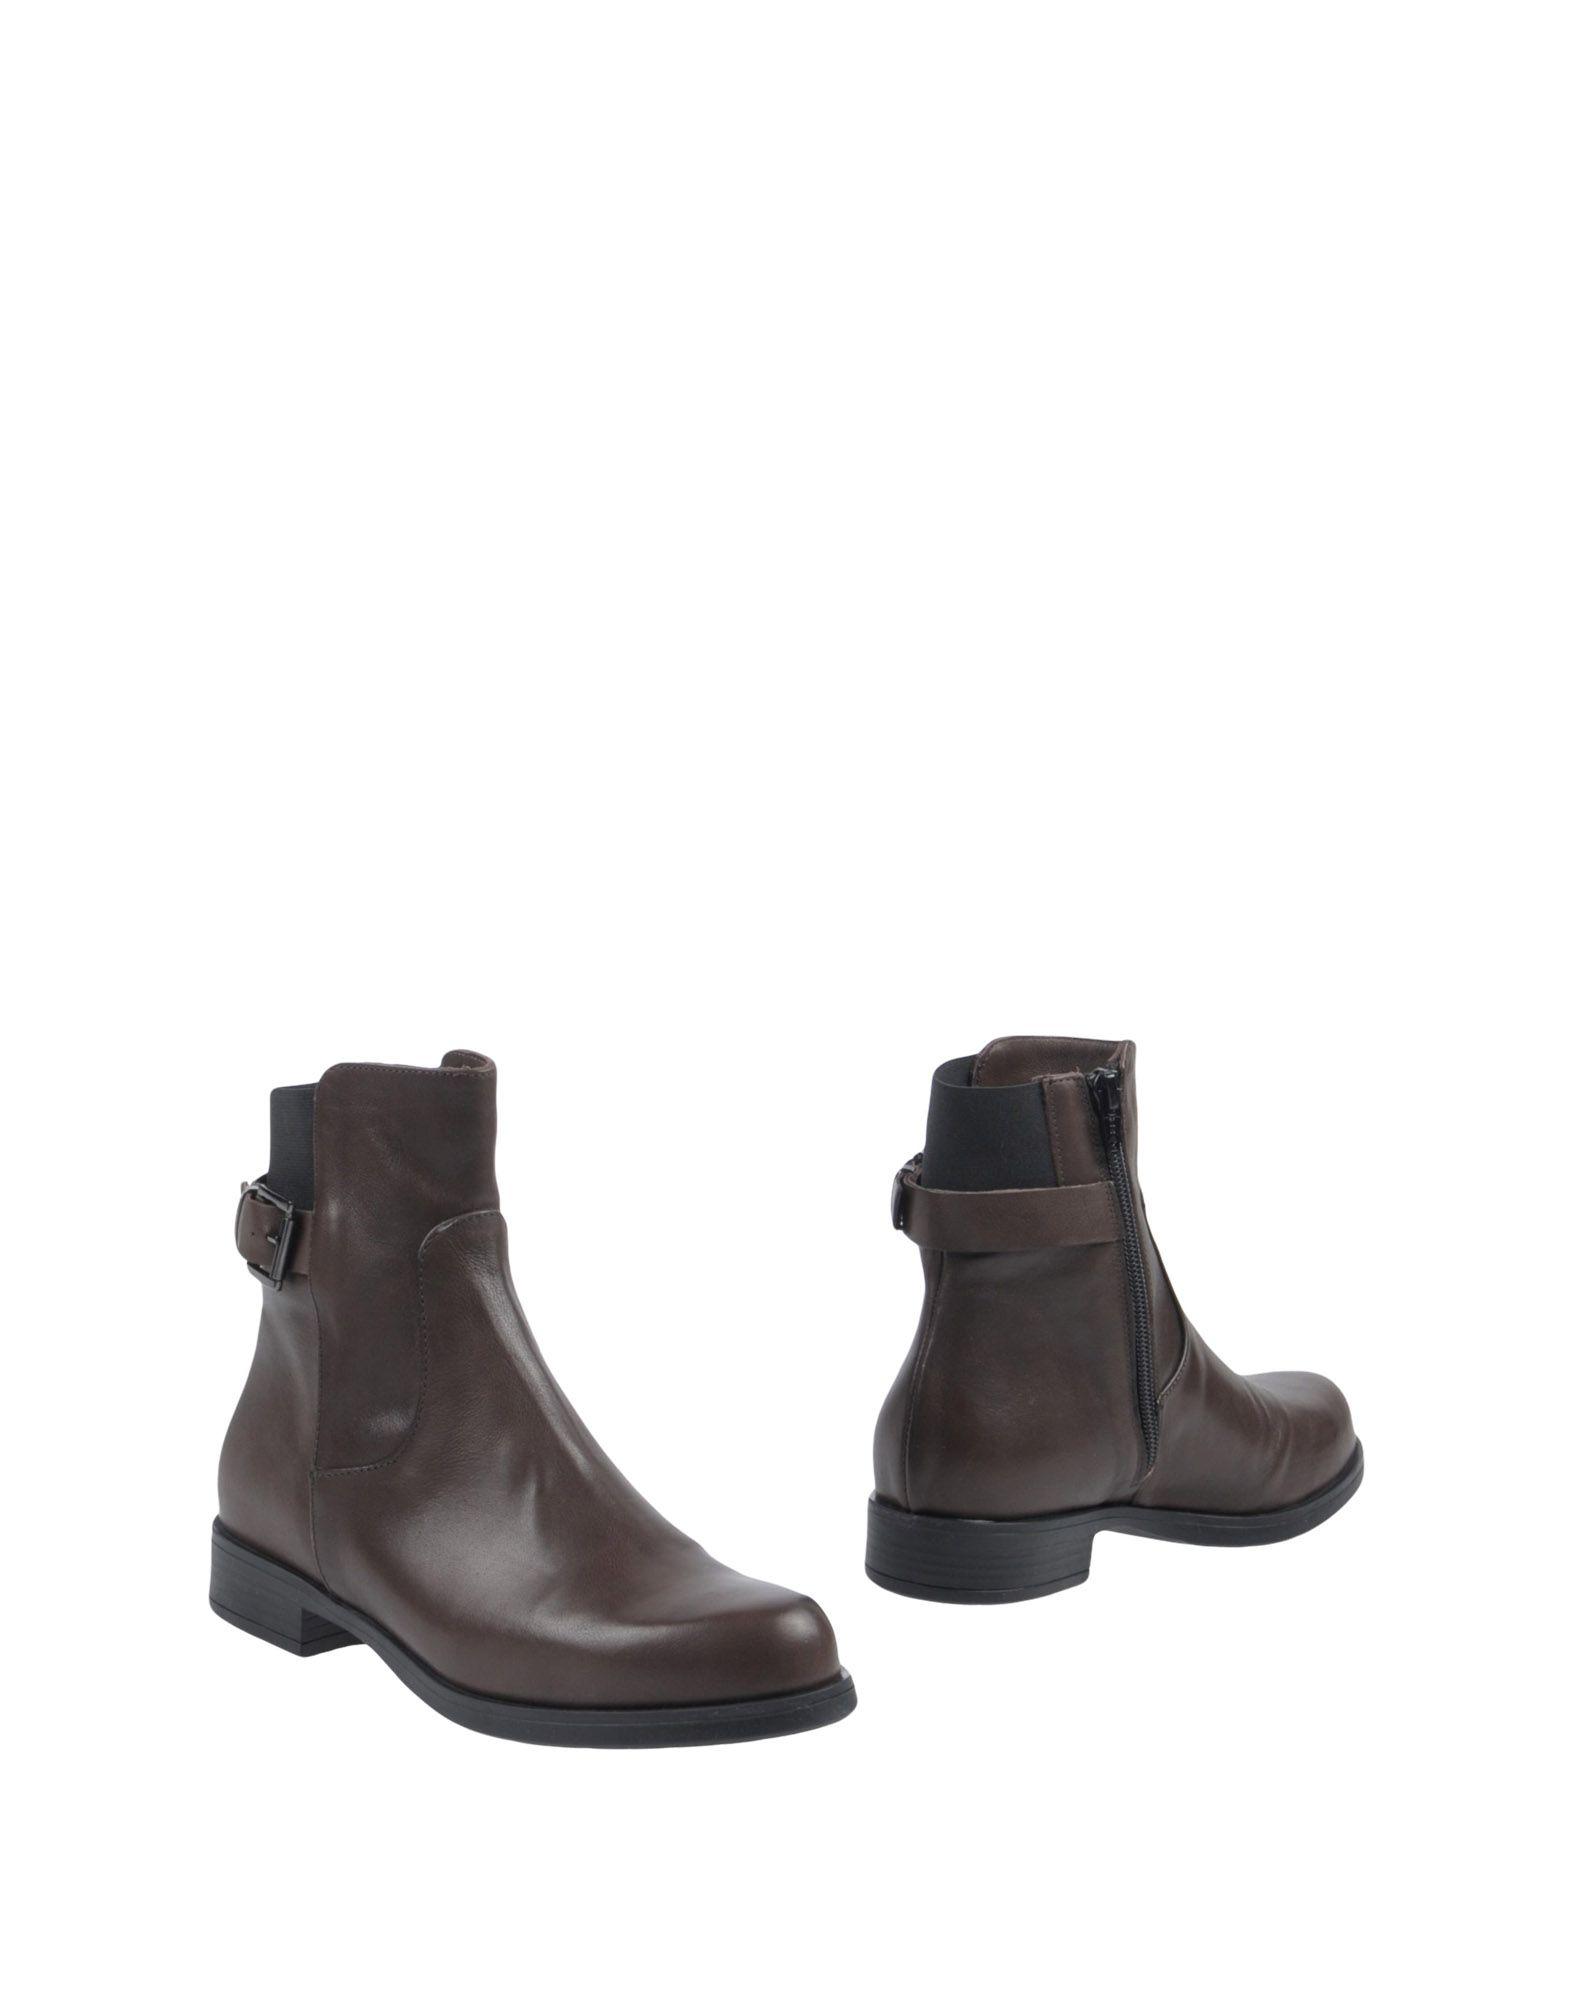 Manufacture D'essai Stiefelette Damen beliebte  11446267MU Gute Qualität beliebte Damen Schuhe 72d531